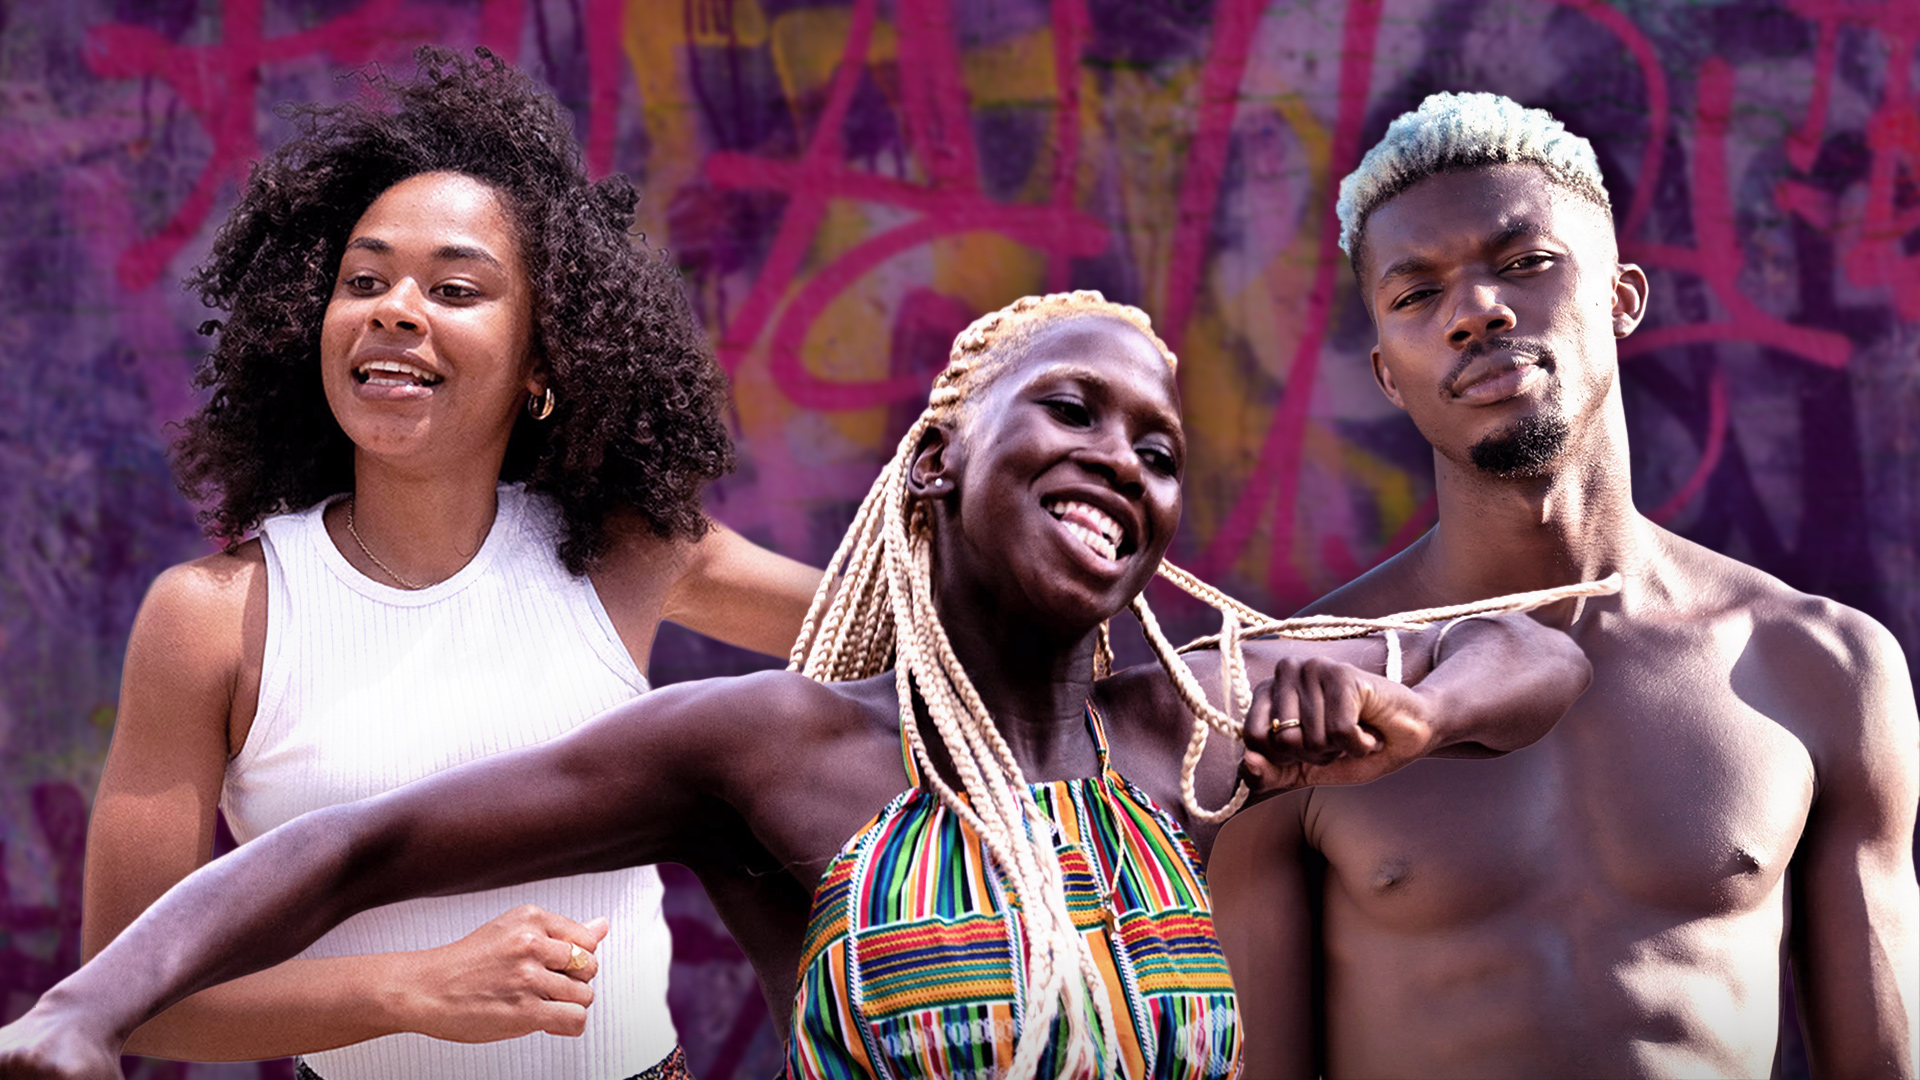 Afrodances